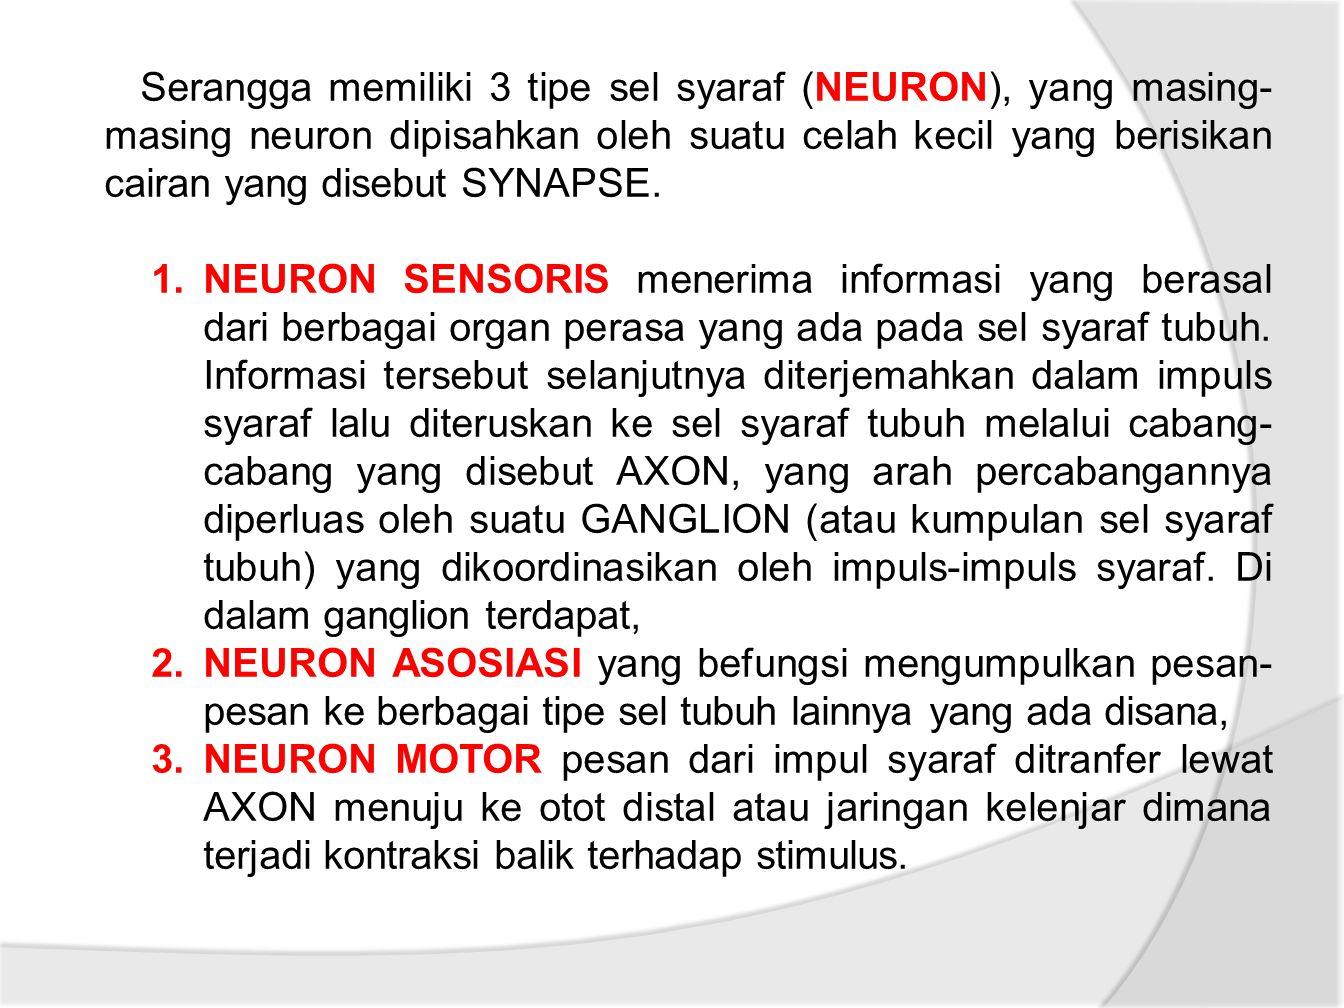 Serangga memiliki 3 tipe sel syaraf (NEURON), yang masing- masing neuron dipisahkan oleh suatu celah kecil yang berisikan cairan yang disebut SYNAPSE.